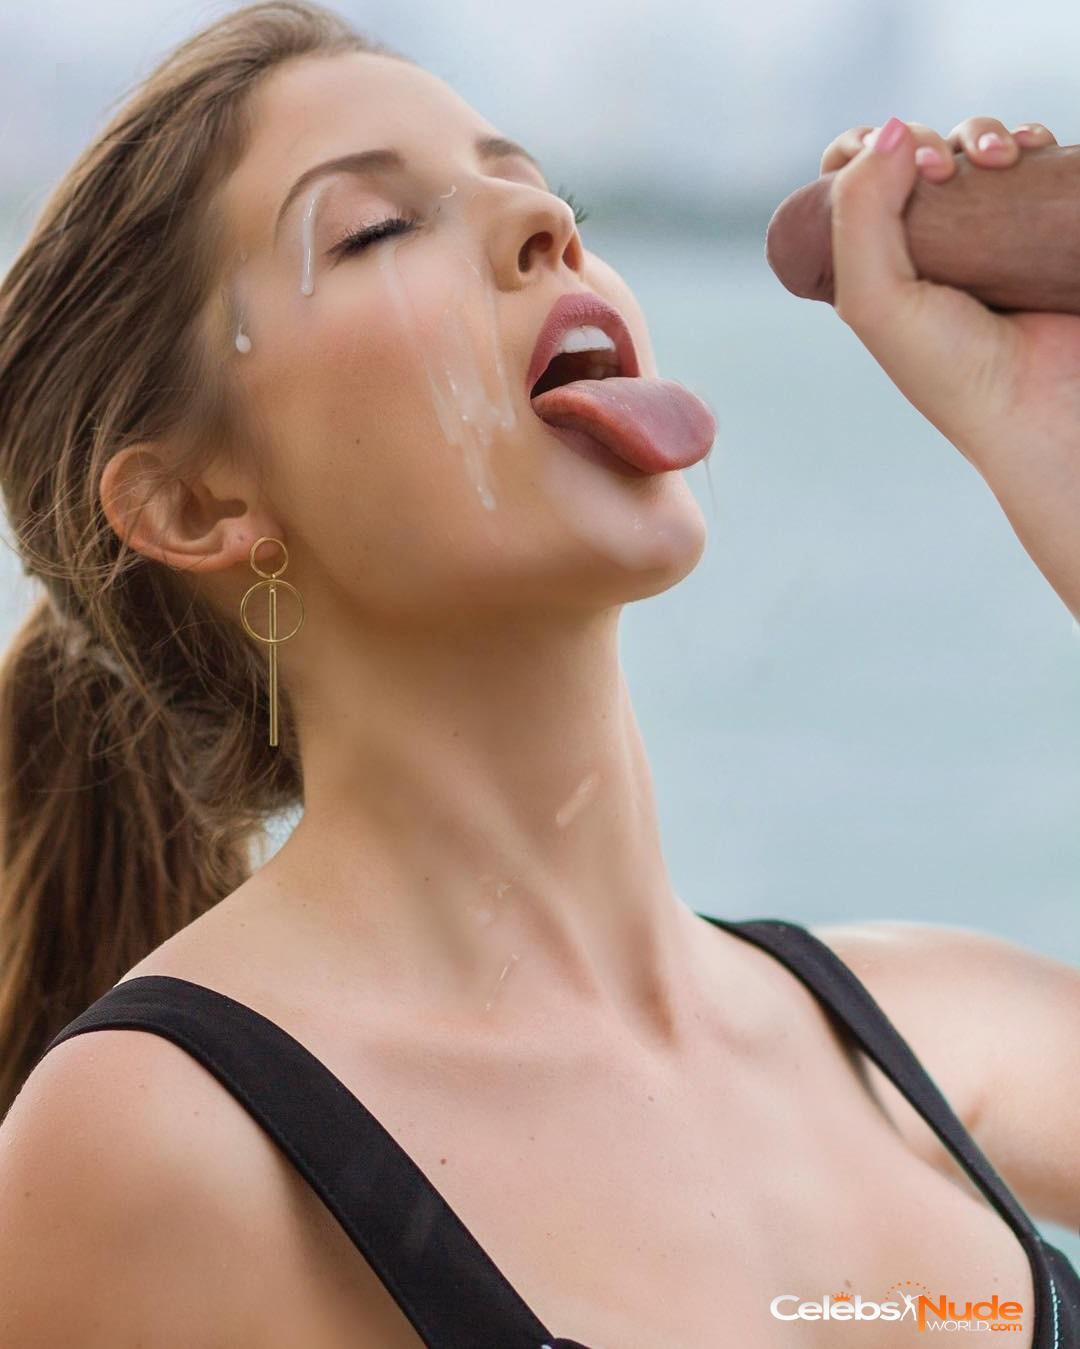 Teasing orgasm videos free